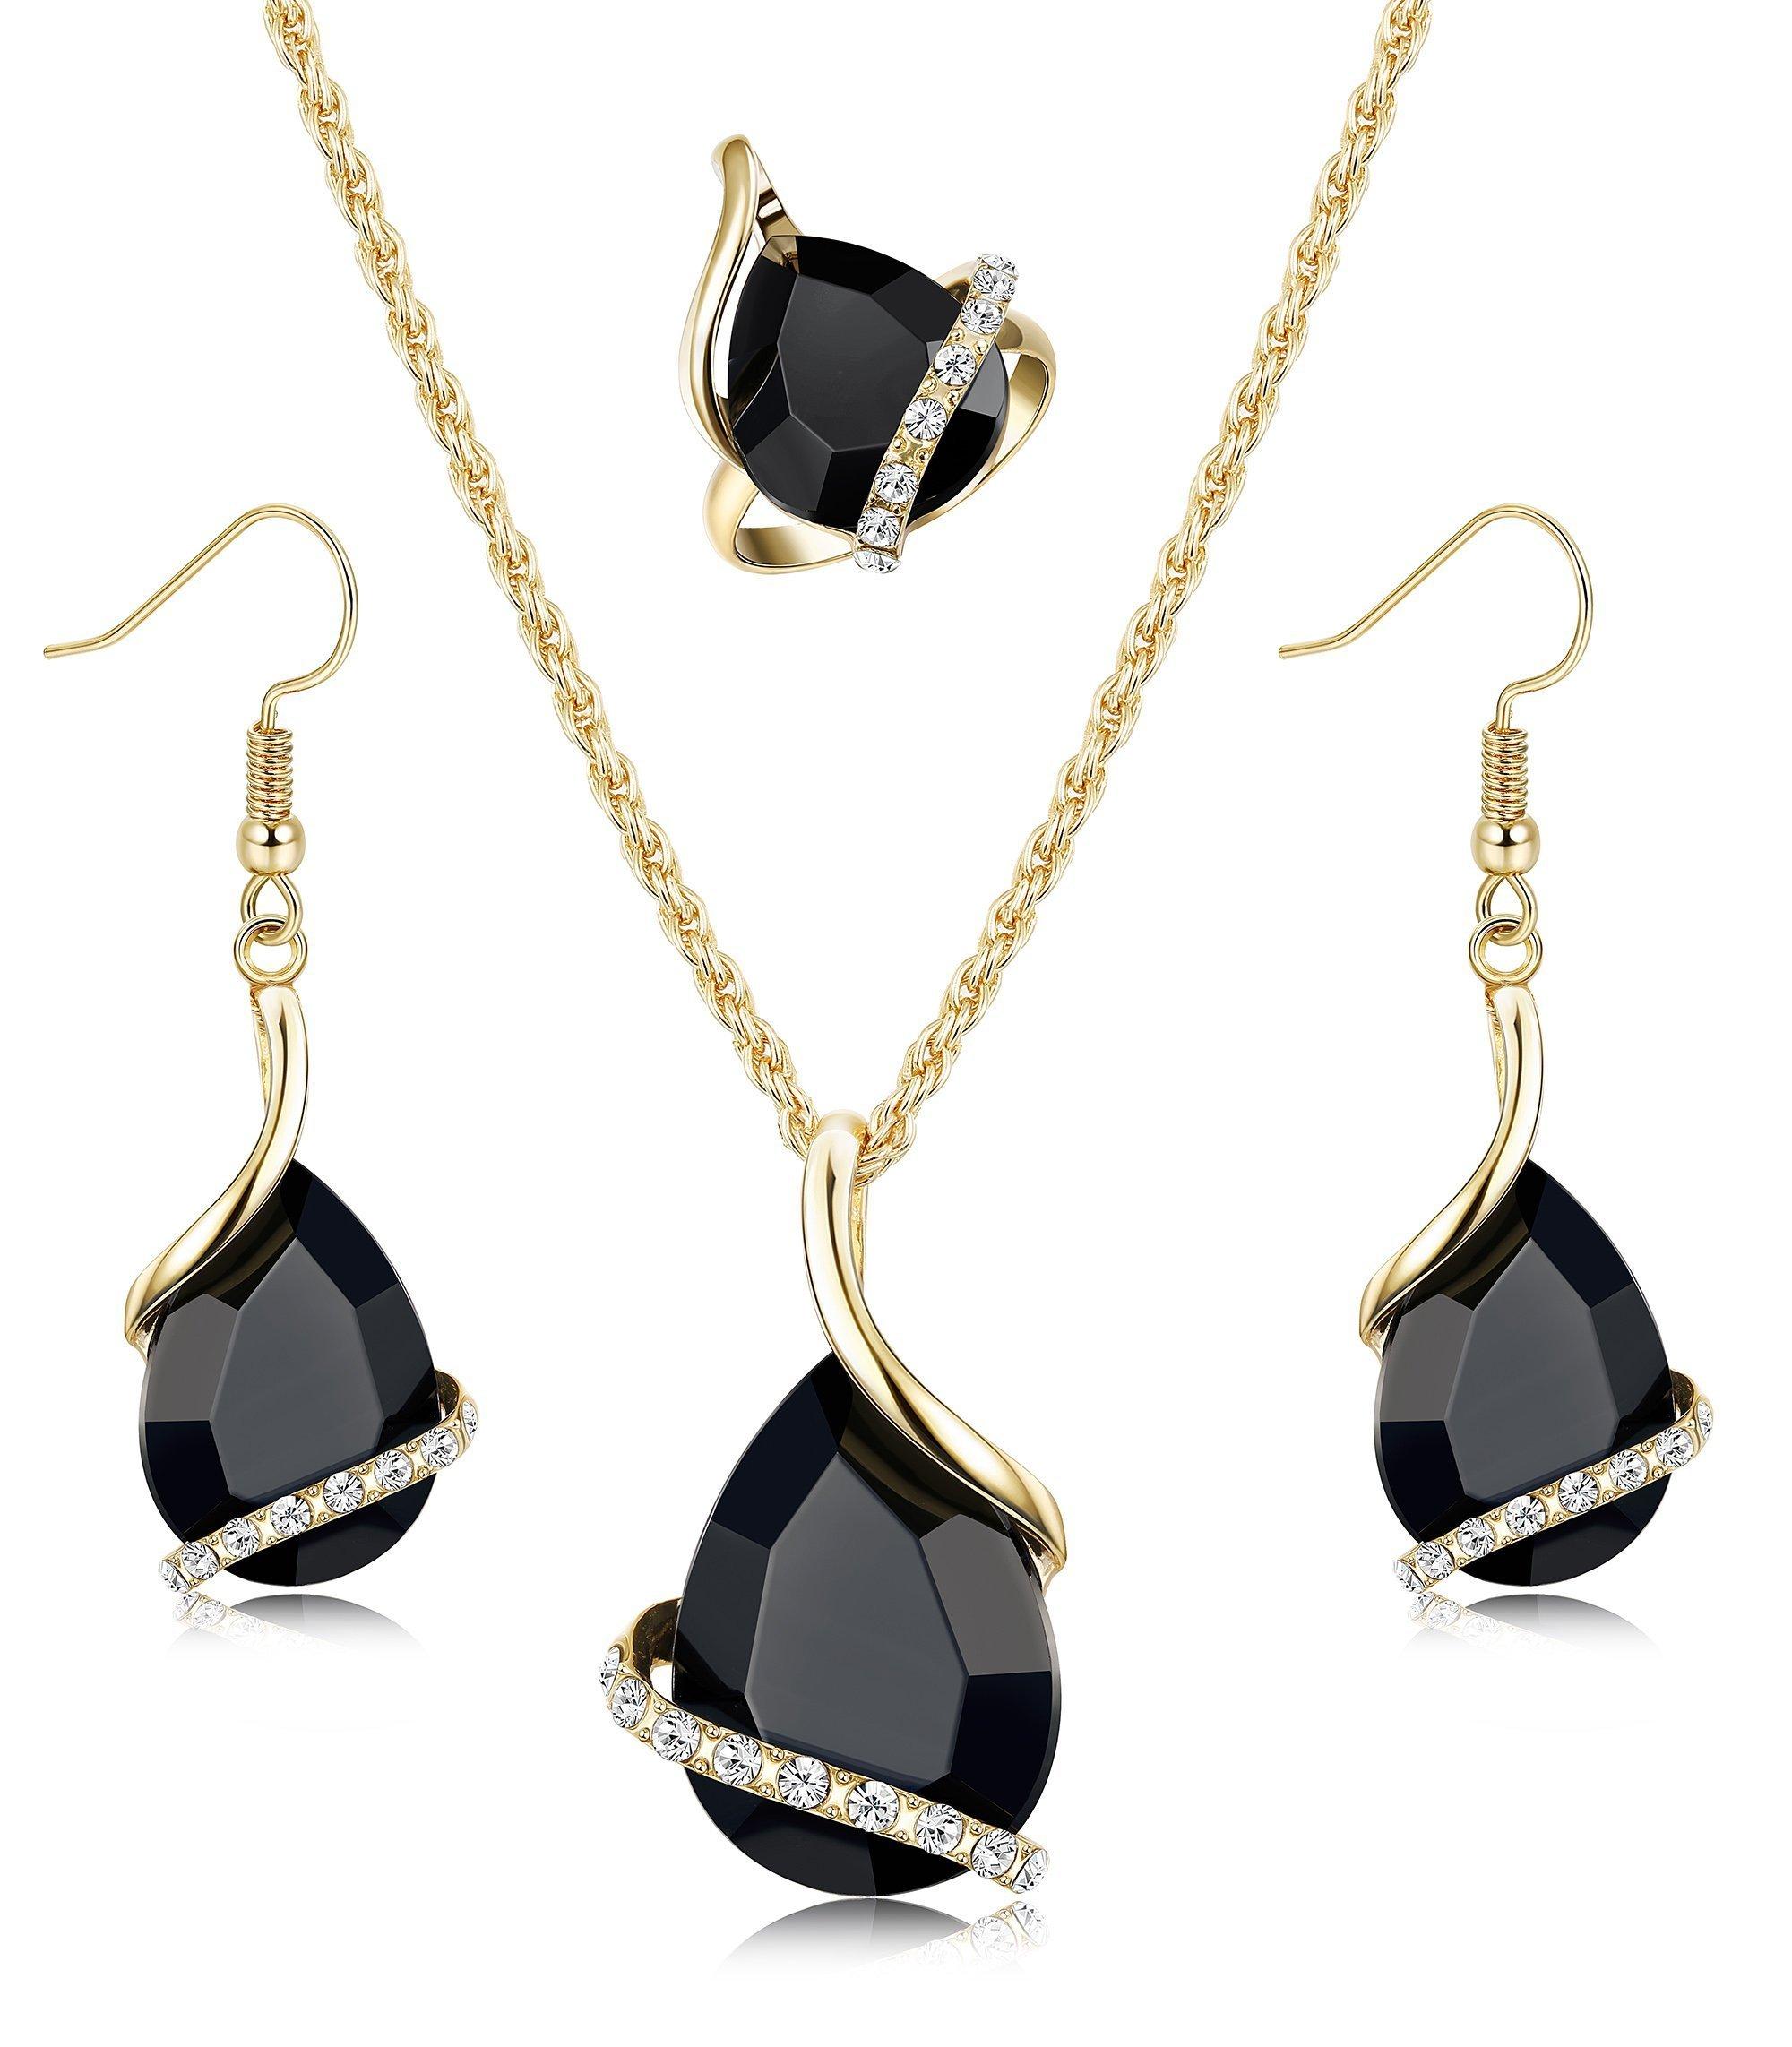 Hanpabum Women Black Jewelry Set Teardrop Pendant Necklace Dangle Drop Earring and CZ Ring Prom Jewelry